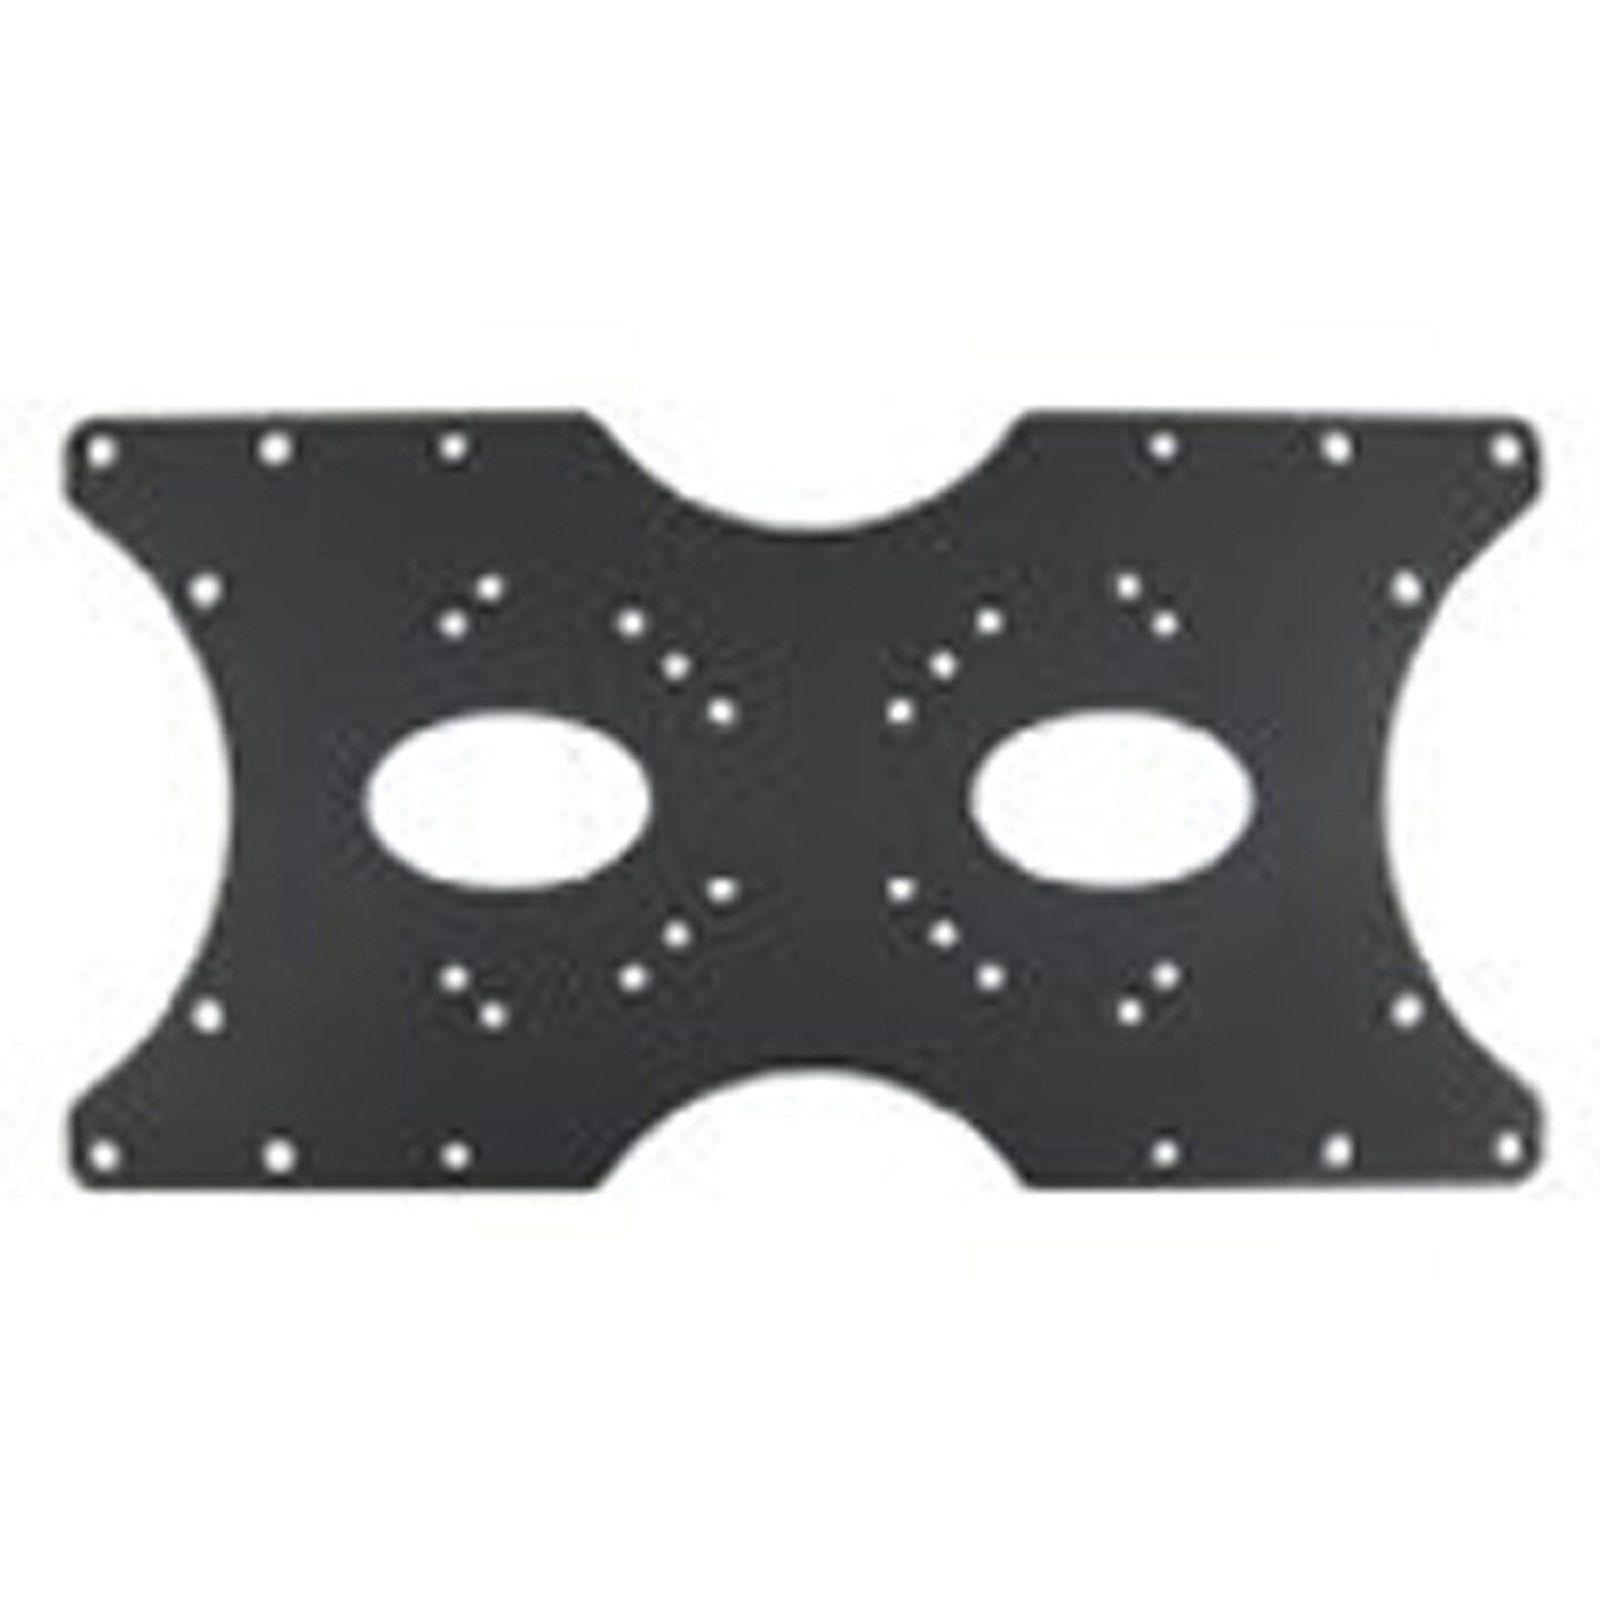 Master Mounts 103 TV Wall Mount & VESA Adapter Plate Black | eBay